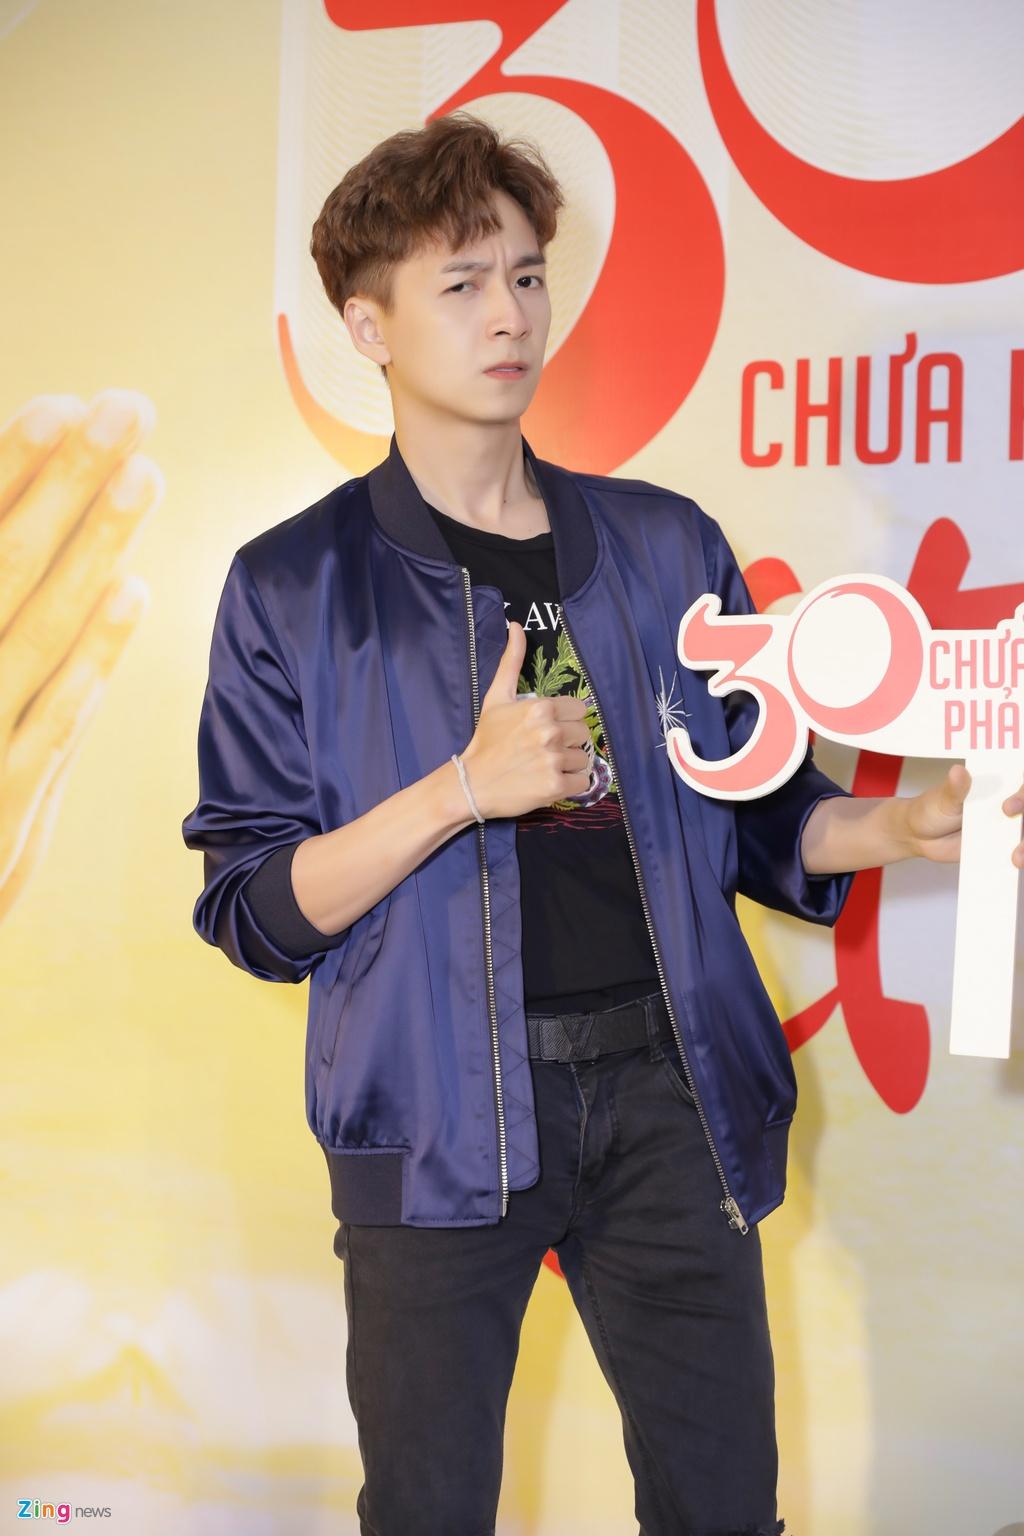 Truong Giang, Nha Phuong cham soc nhau truoc ong kinh hinh anh 13 KIT_zing_5526.JPG